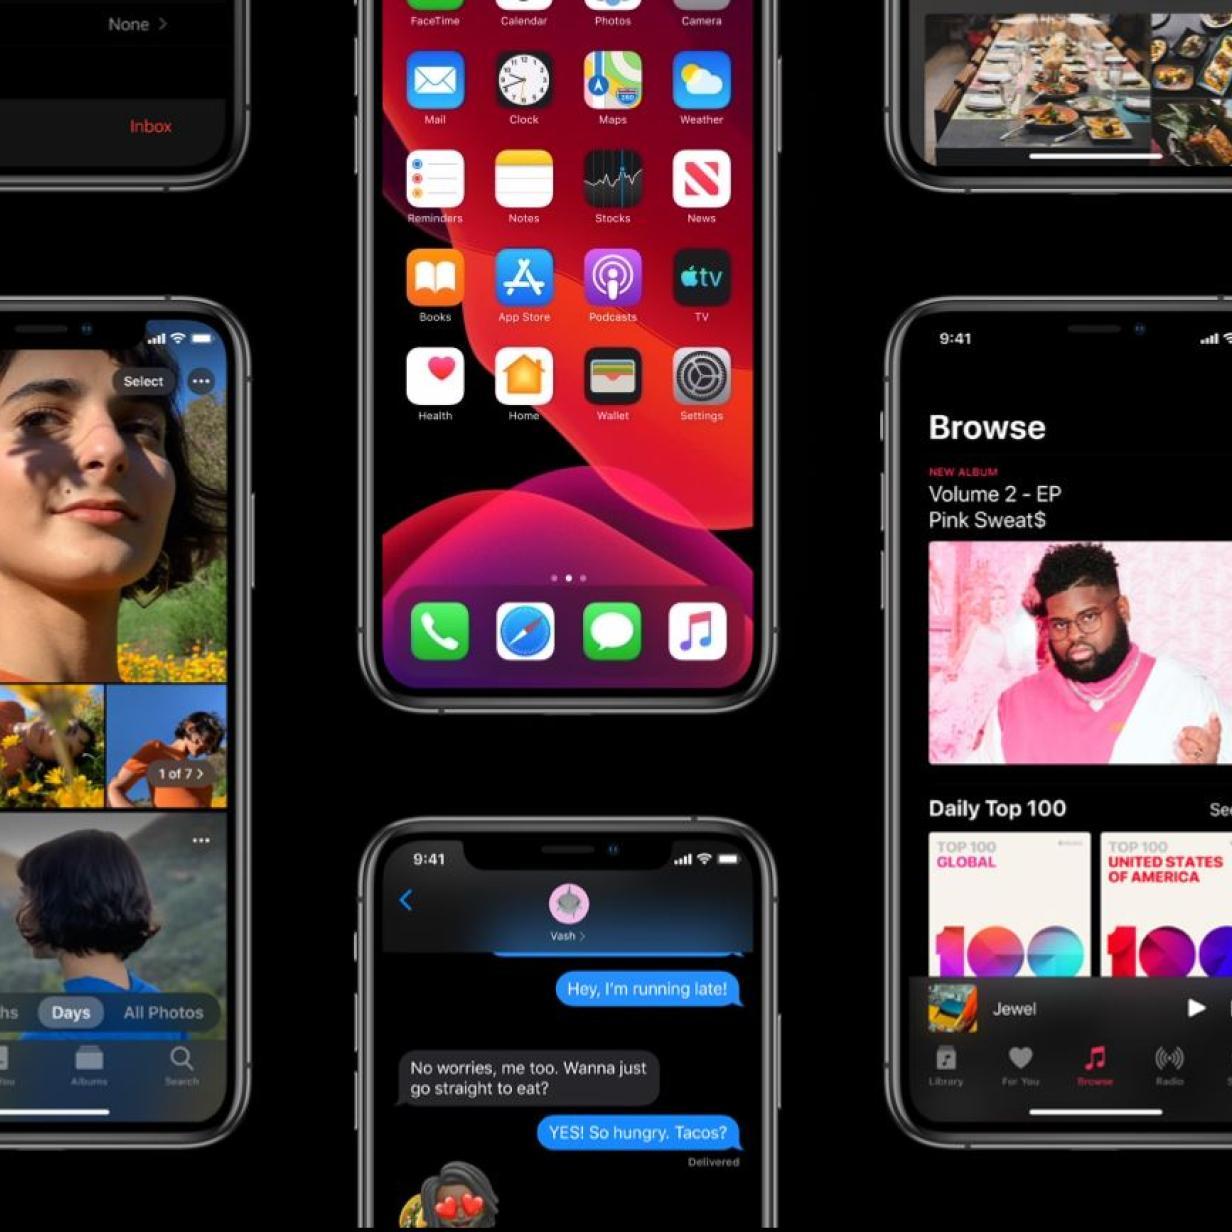 Schwerer Bug in iOS 13 legt Passwörter offen